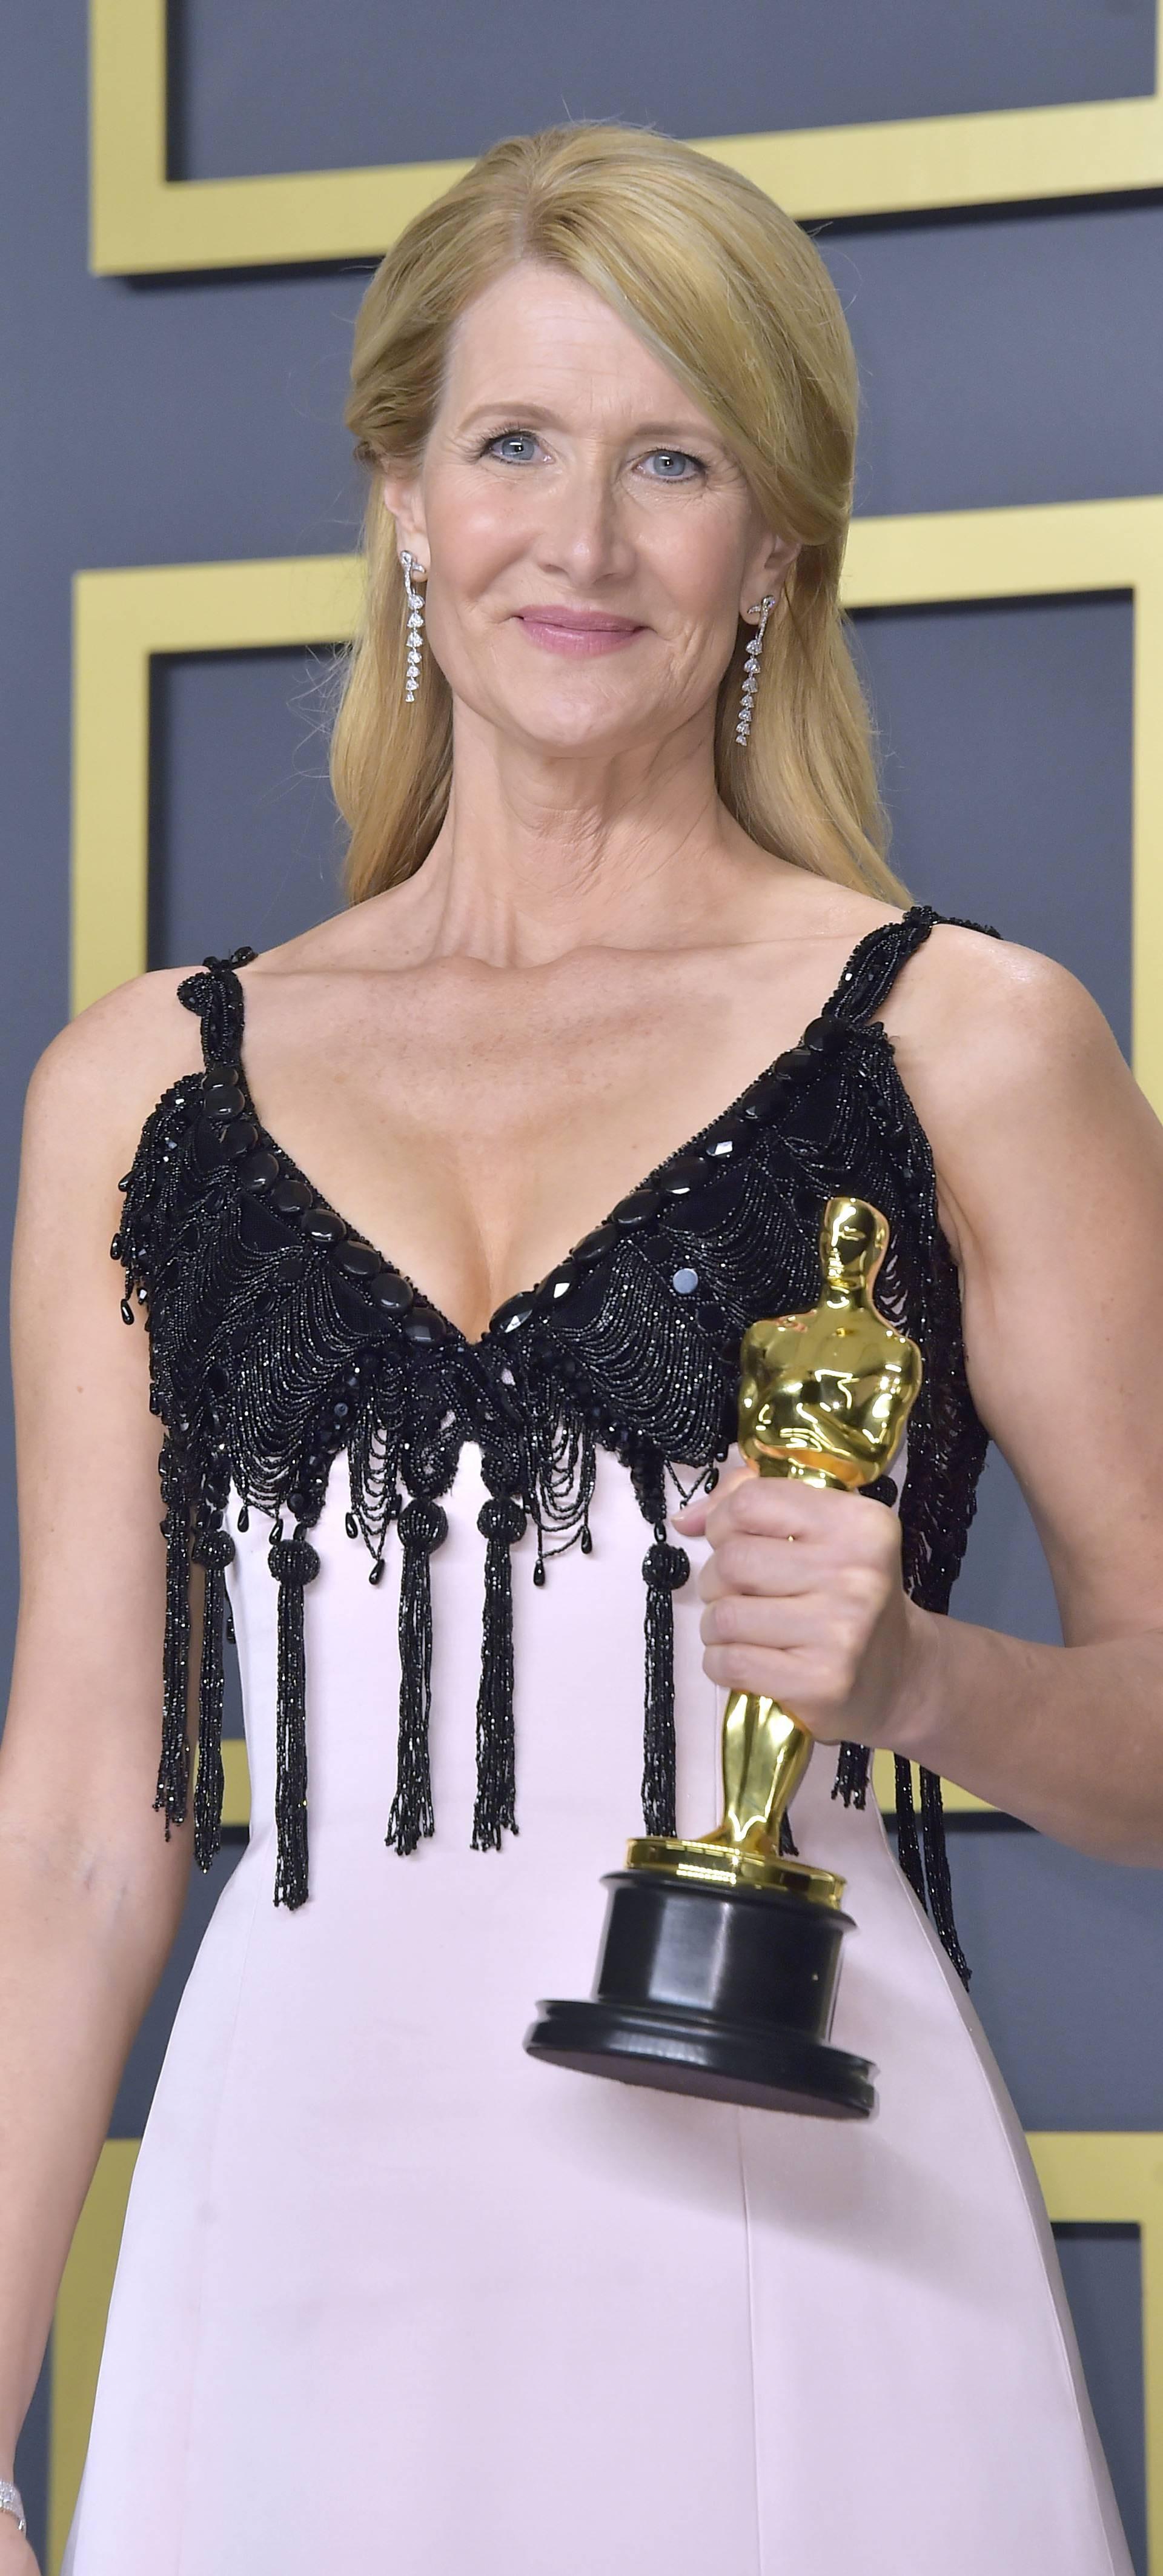 Oscar 2020 award winner photocall in Los Angeles